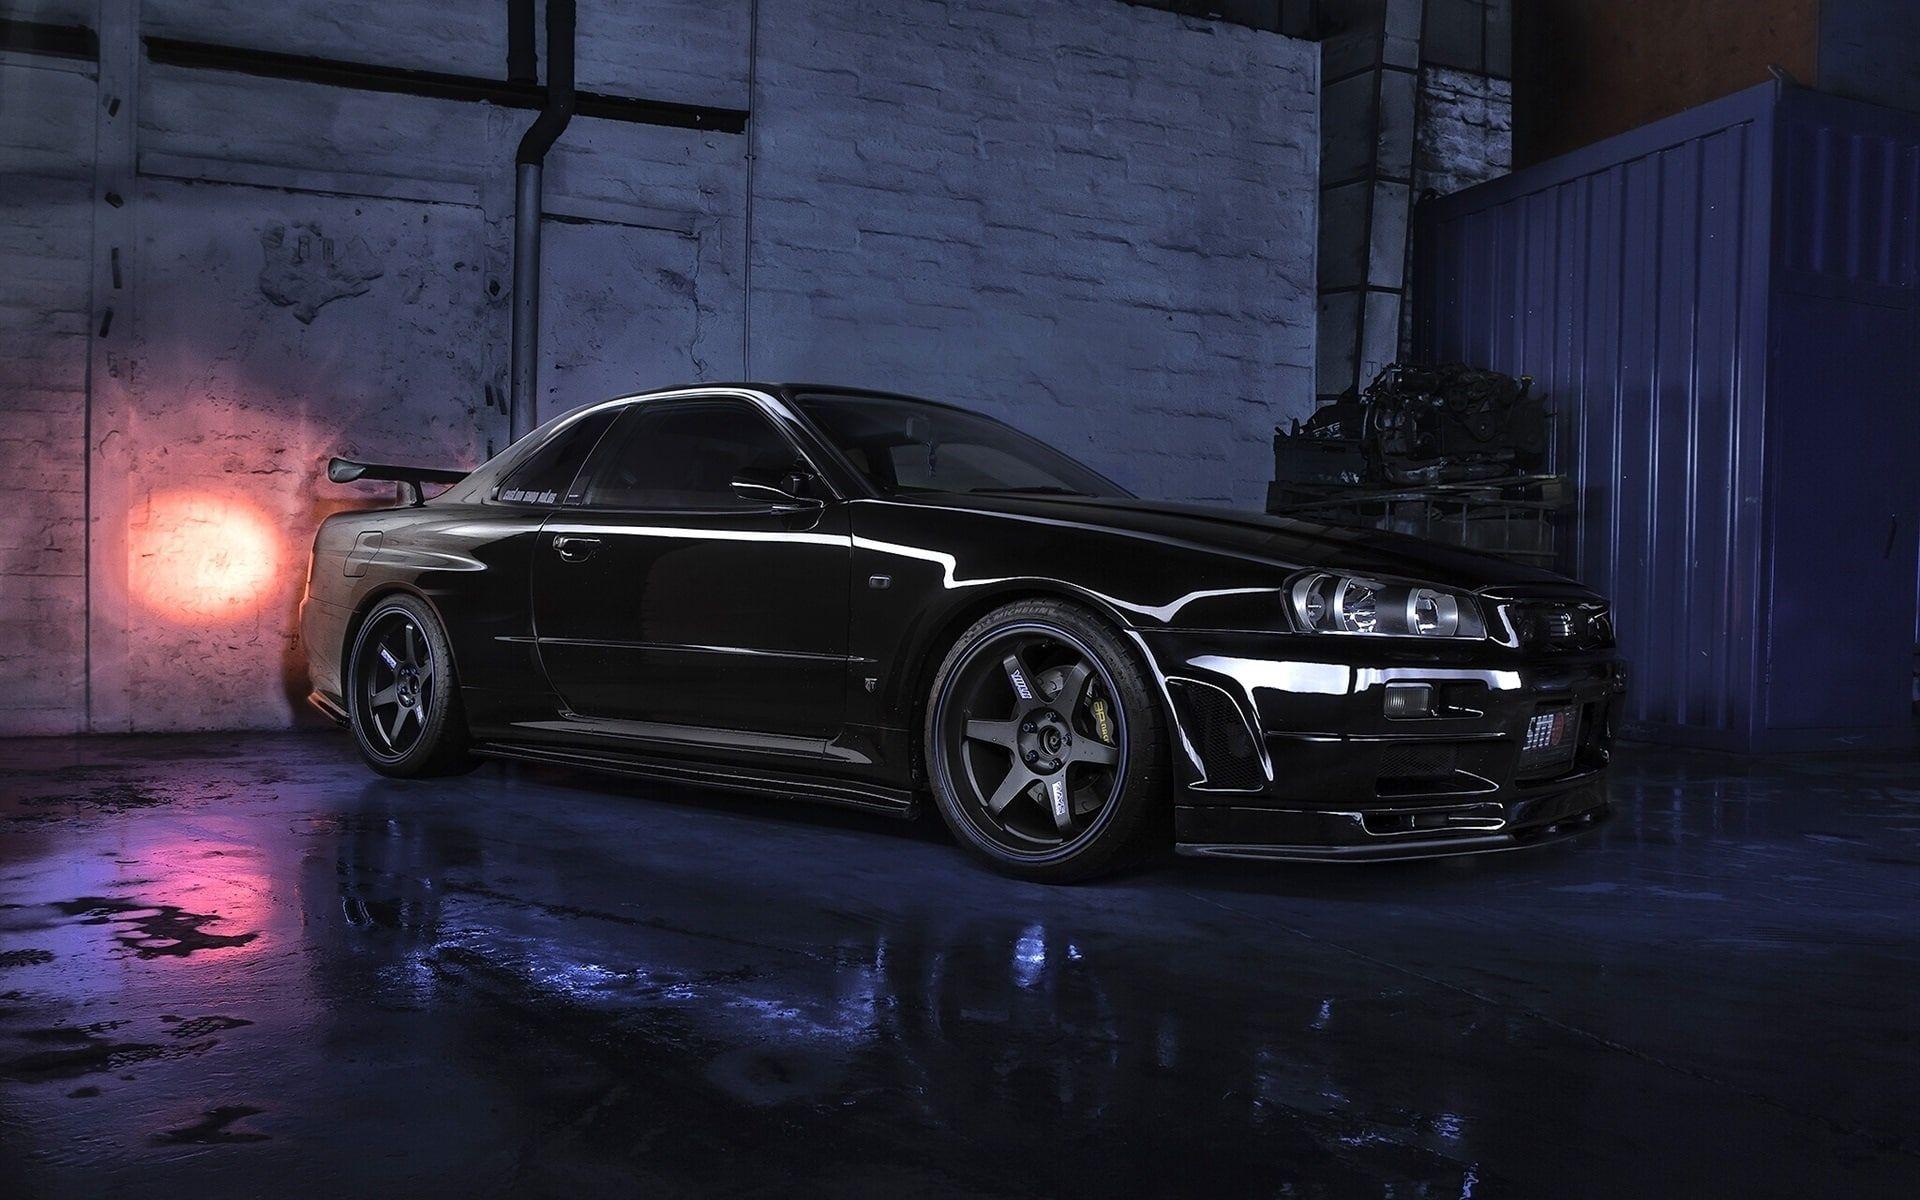 Nissan Skyline R34 Gtr V Black Car Night Nissan Skyline R34 Nissan Skyline Skyline Gtr R34